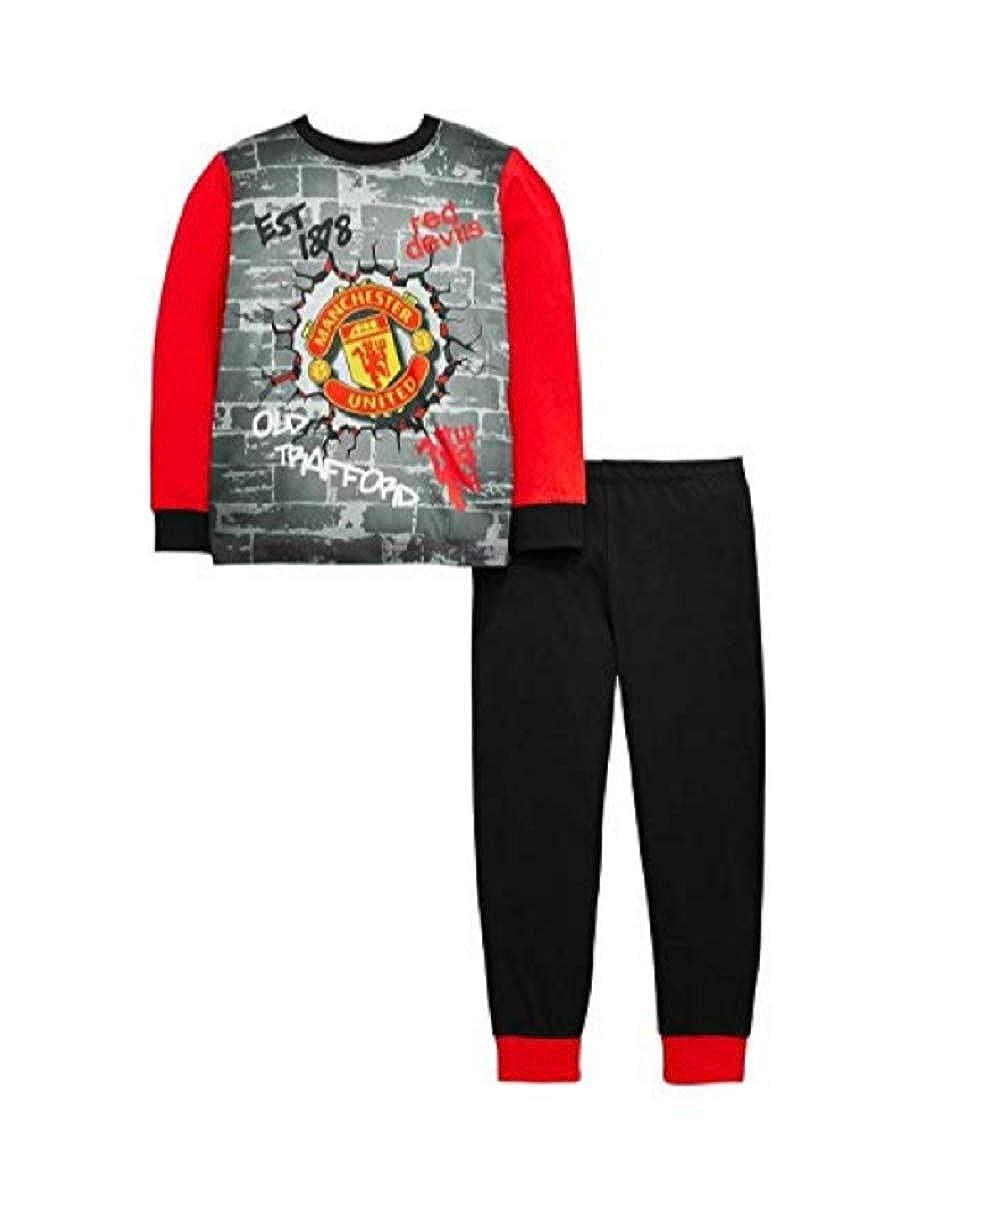 Boys Girls Unisex Kids Manchester United Long Pyjama Set Old Trafford - Sizes 3-12 Years WH31036